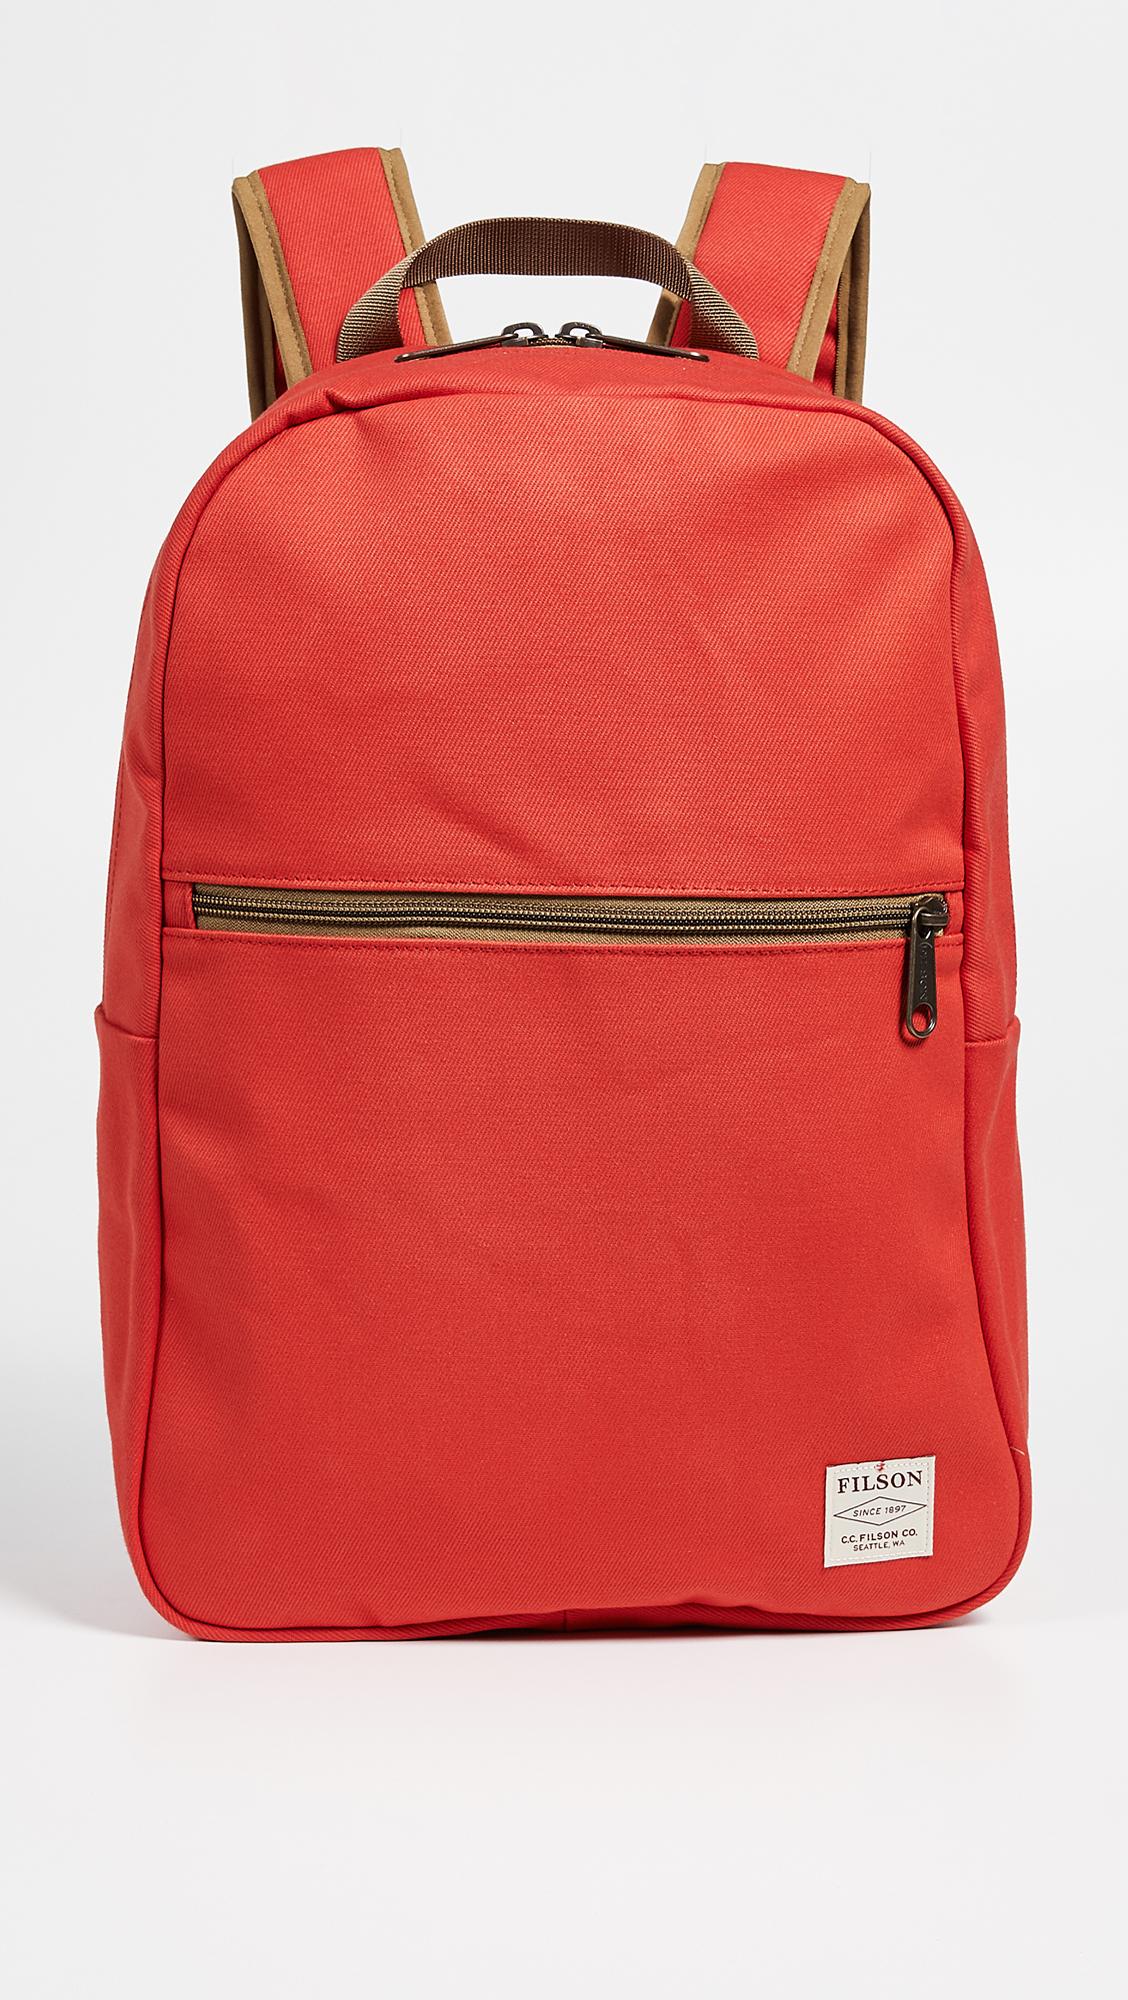 e70b65a6b6 Filson Bandera Backpack | EAST DANE